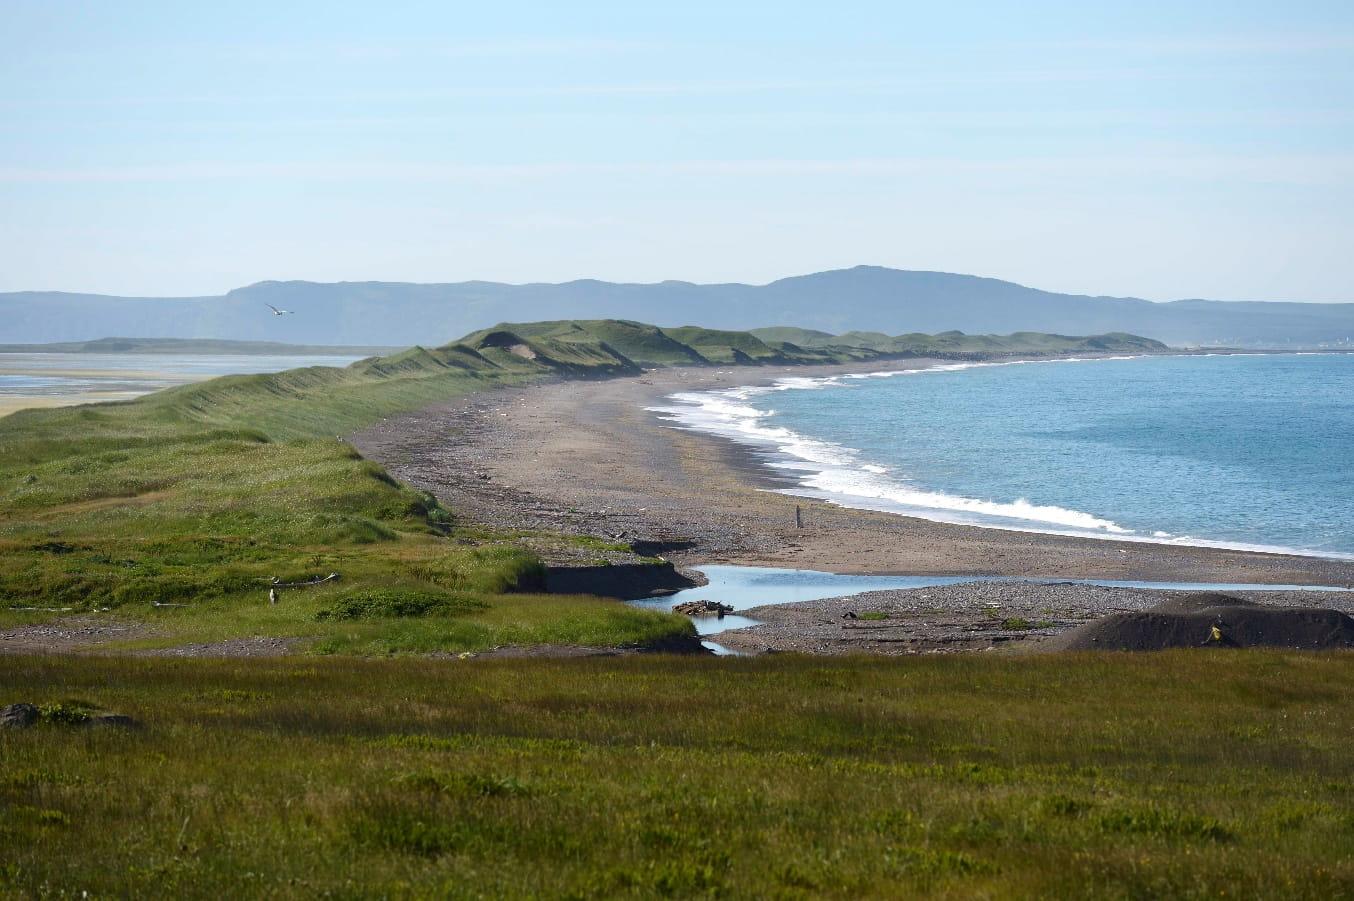 Beach and shoreline in Saint Pierre and Miquelon